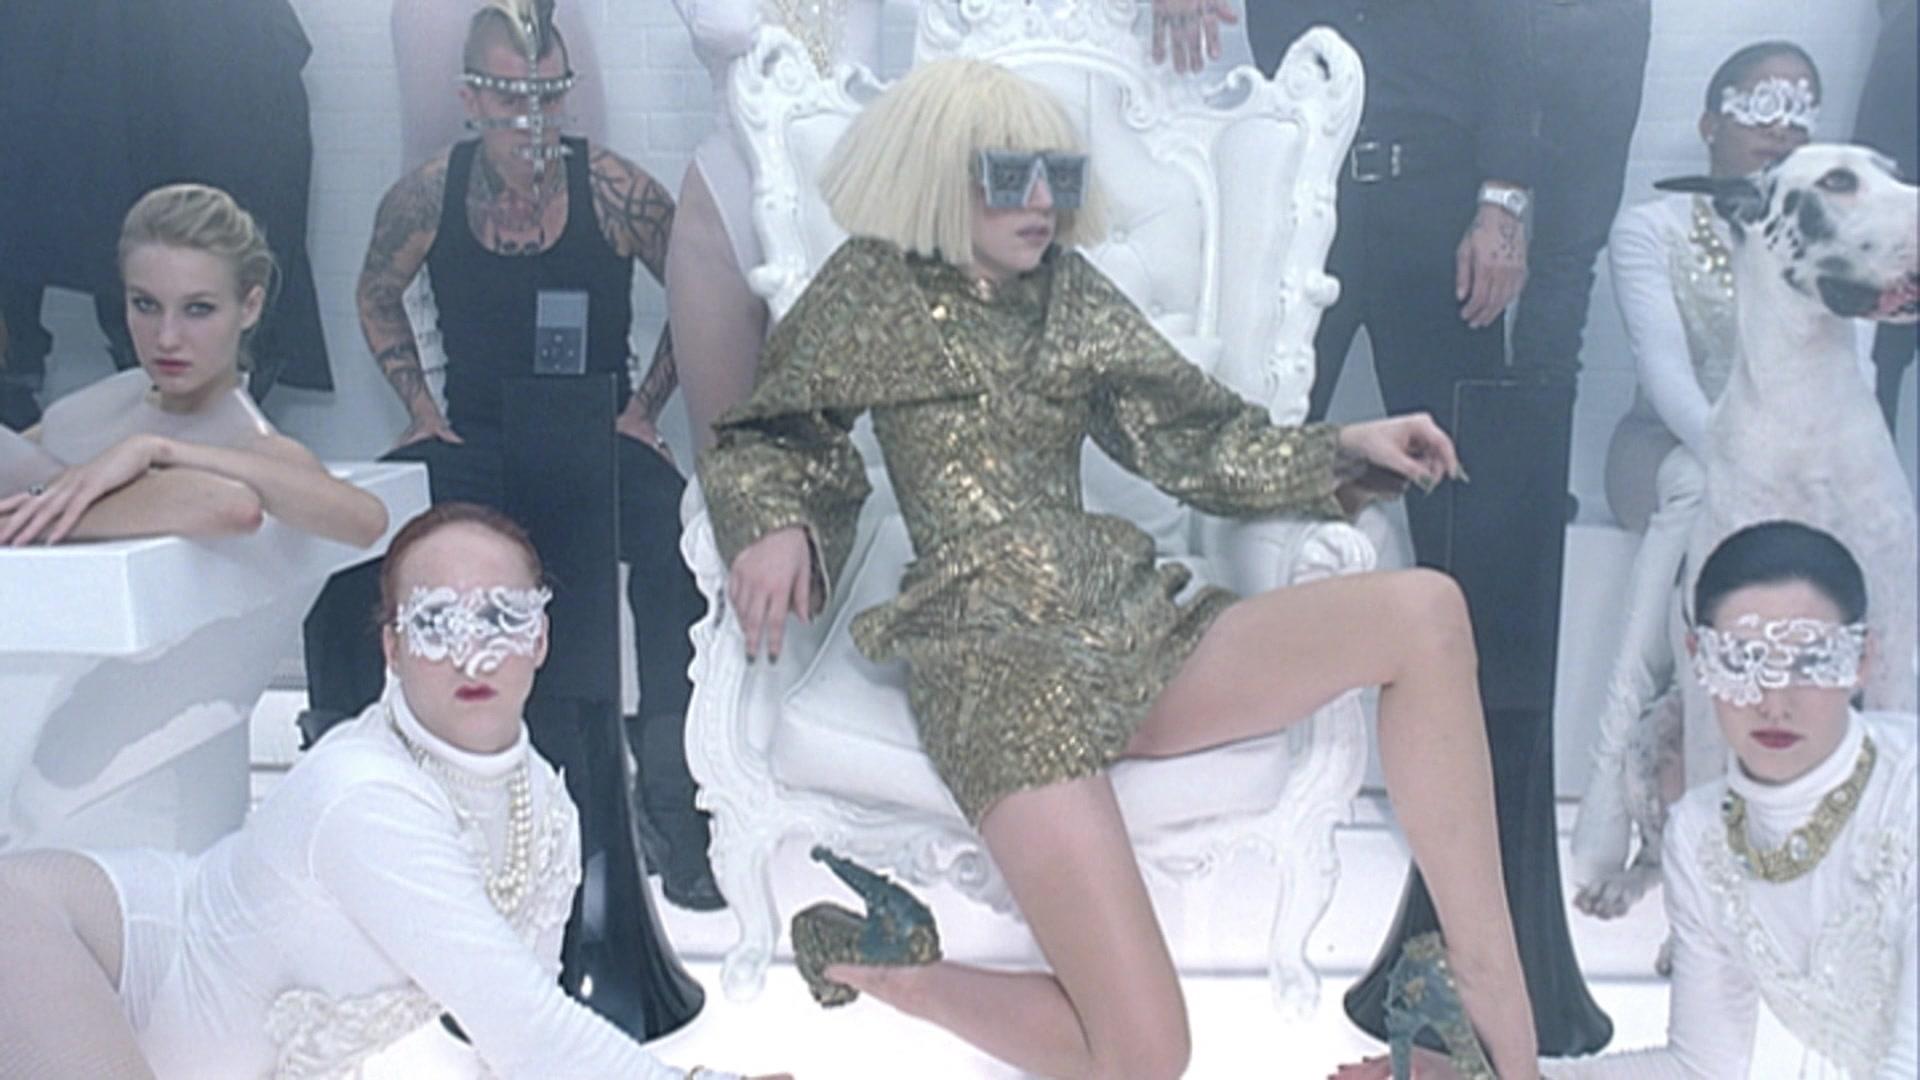 File:Lady Gaga - Bad Romance 002.jpg